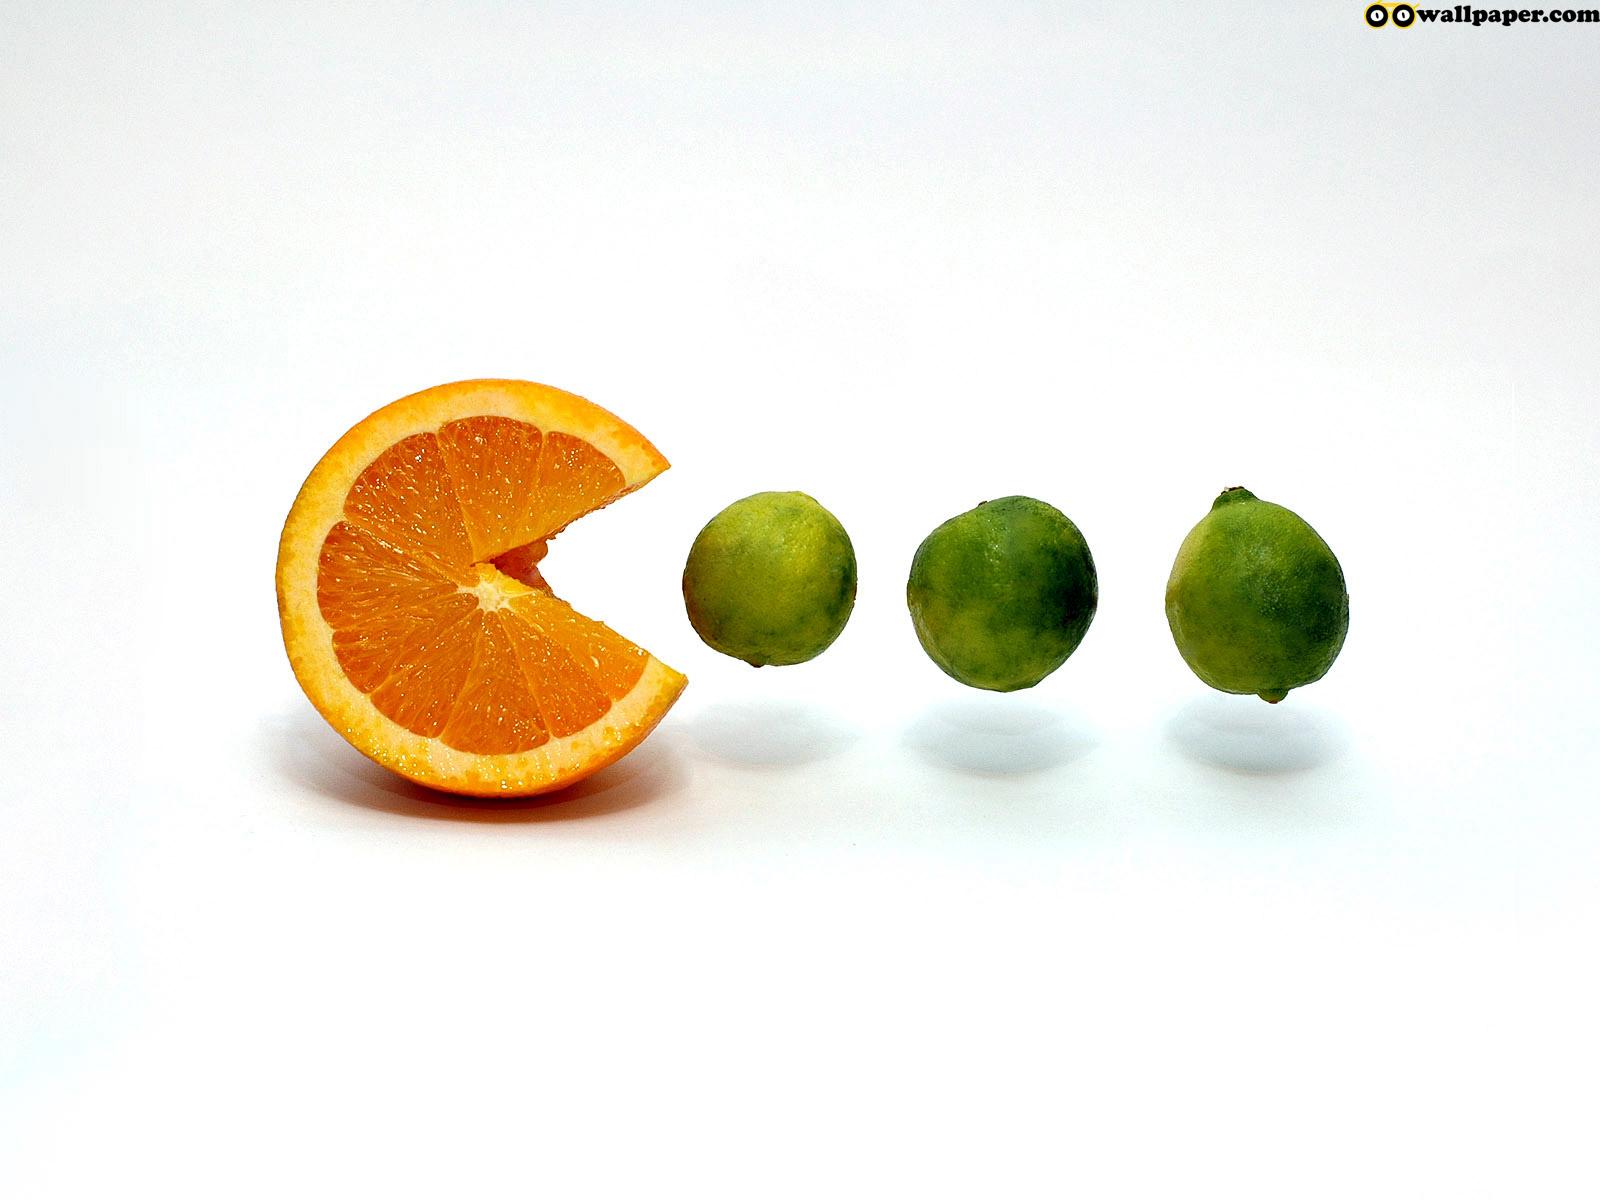 http://4.bp.blogspot.com/-fSKvFgKlUgc/TxkeeVZXftI/AAAAAAAAD4U/LsJZS_Y_Q80/s1600/oo_food_orange_lemon.jpg